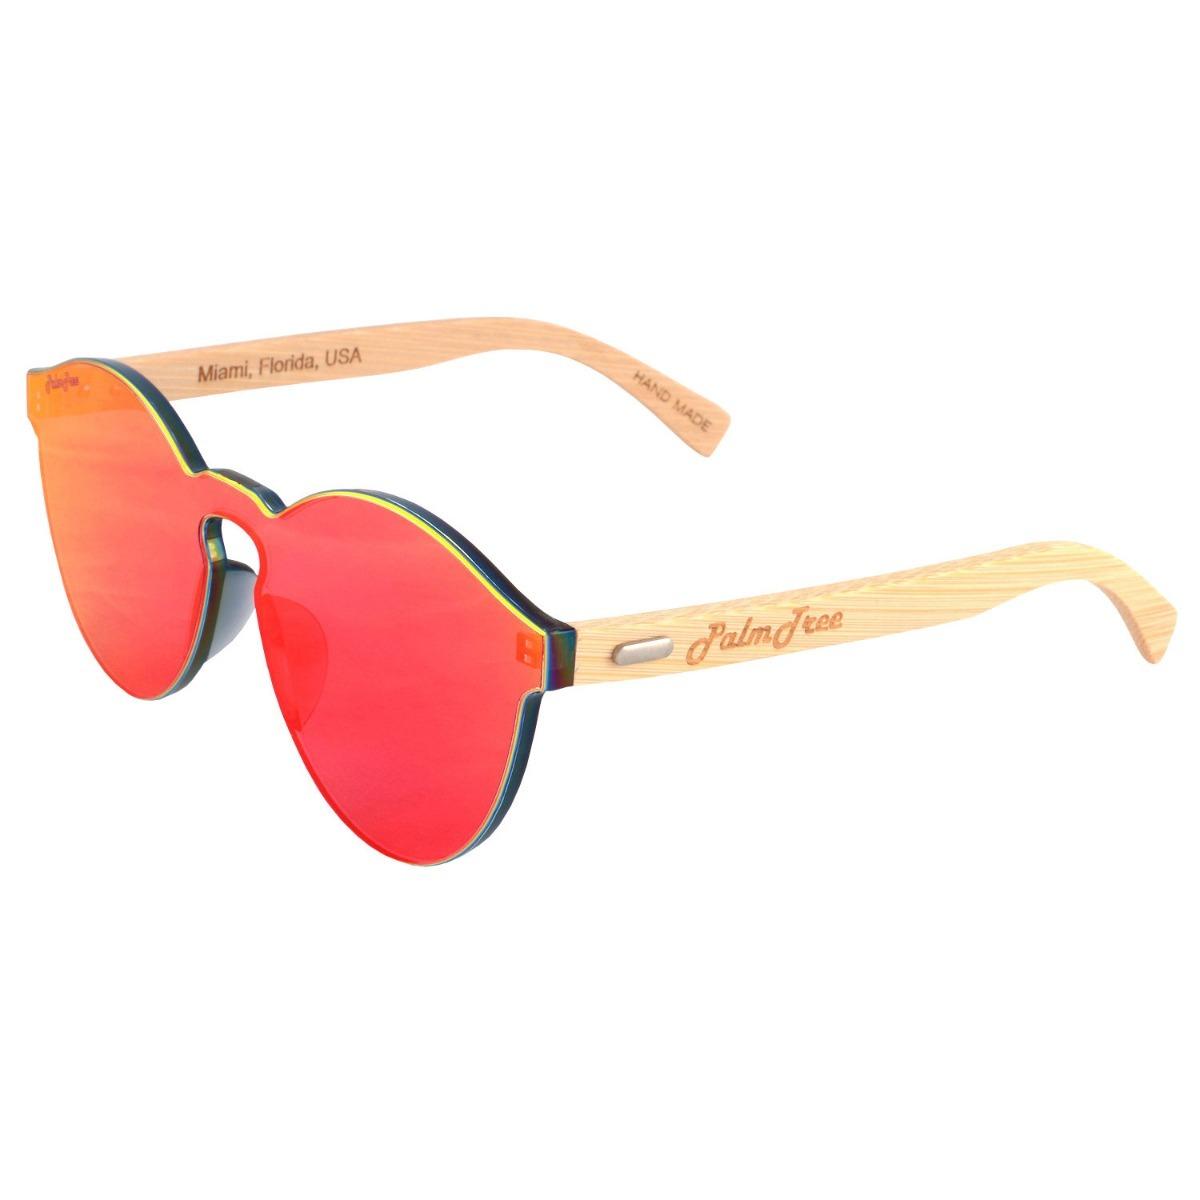 986b9f8475 lentes de sol madera bamboo rojos palmtree uv400 ecologico ...